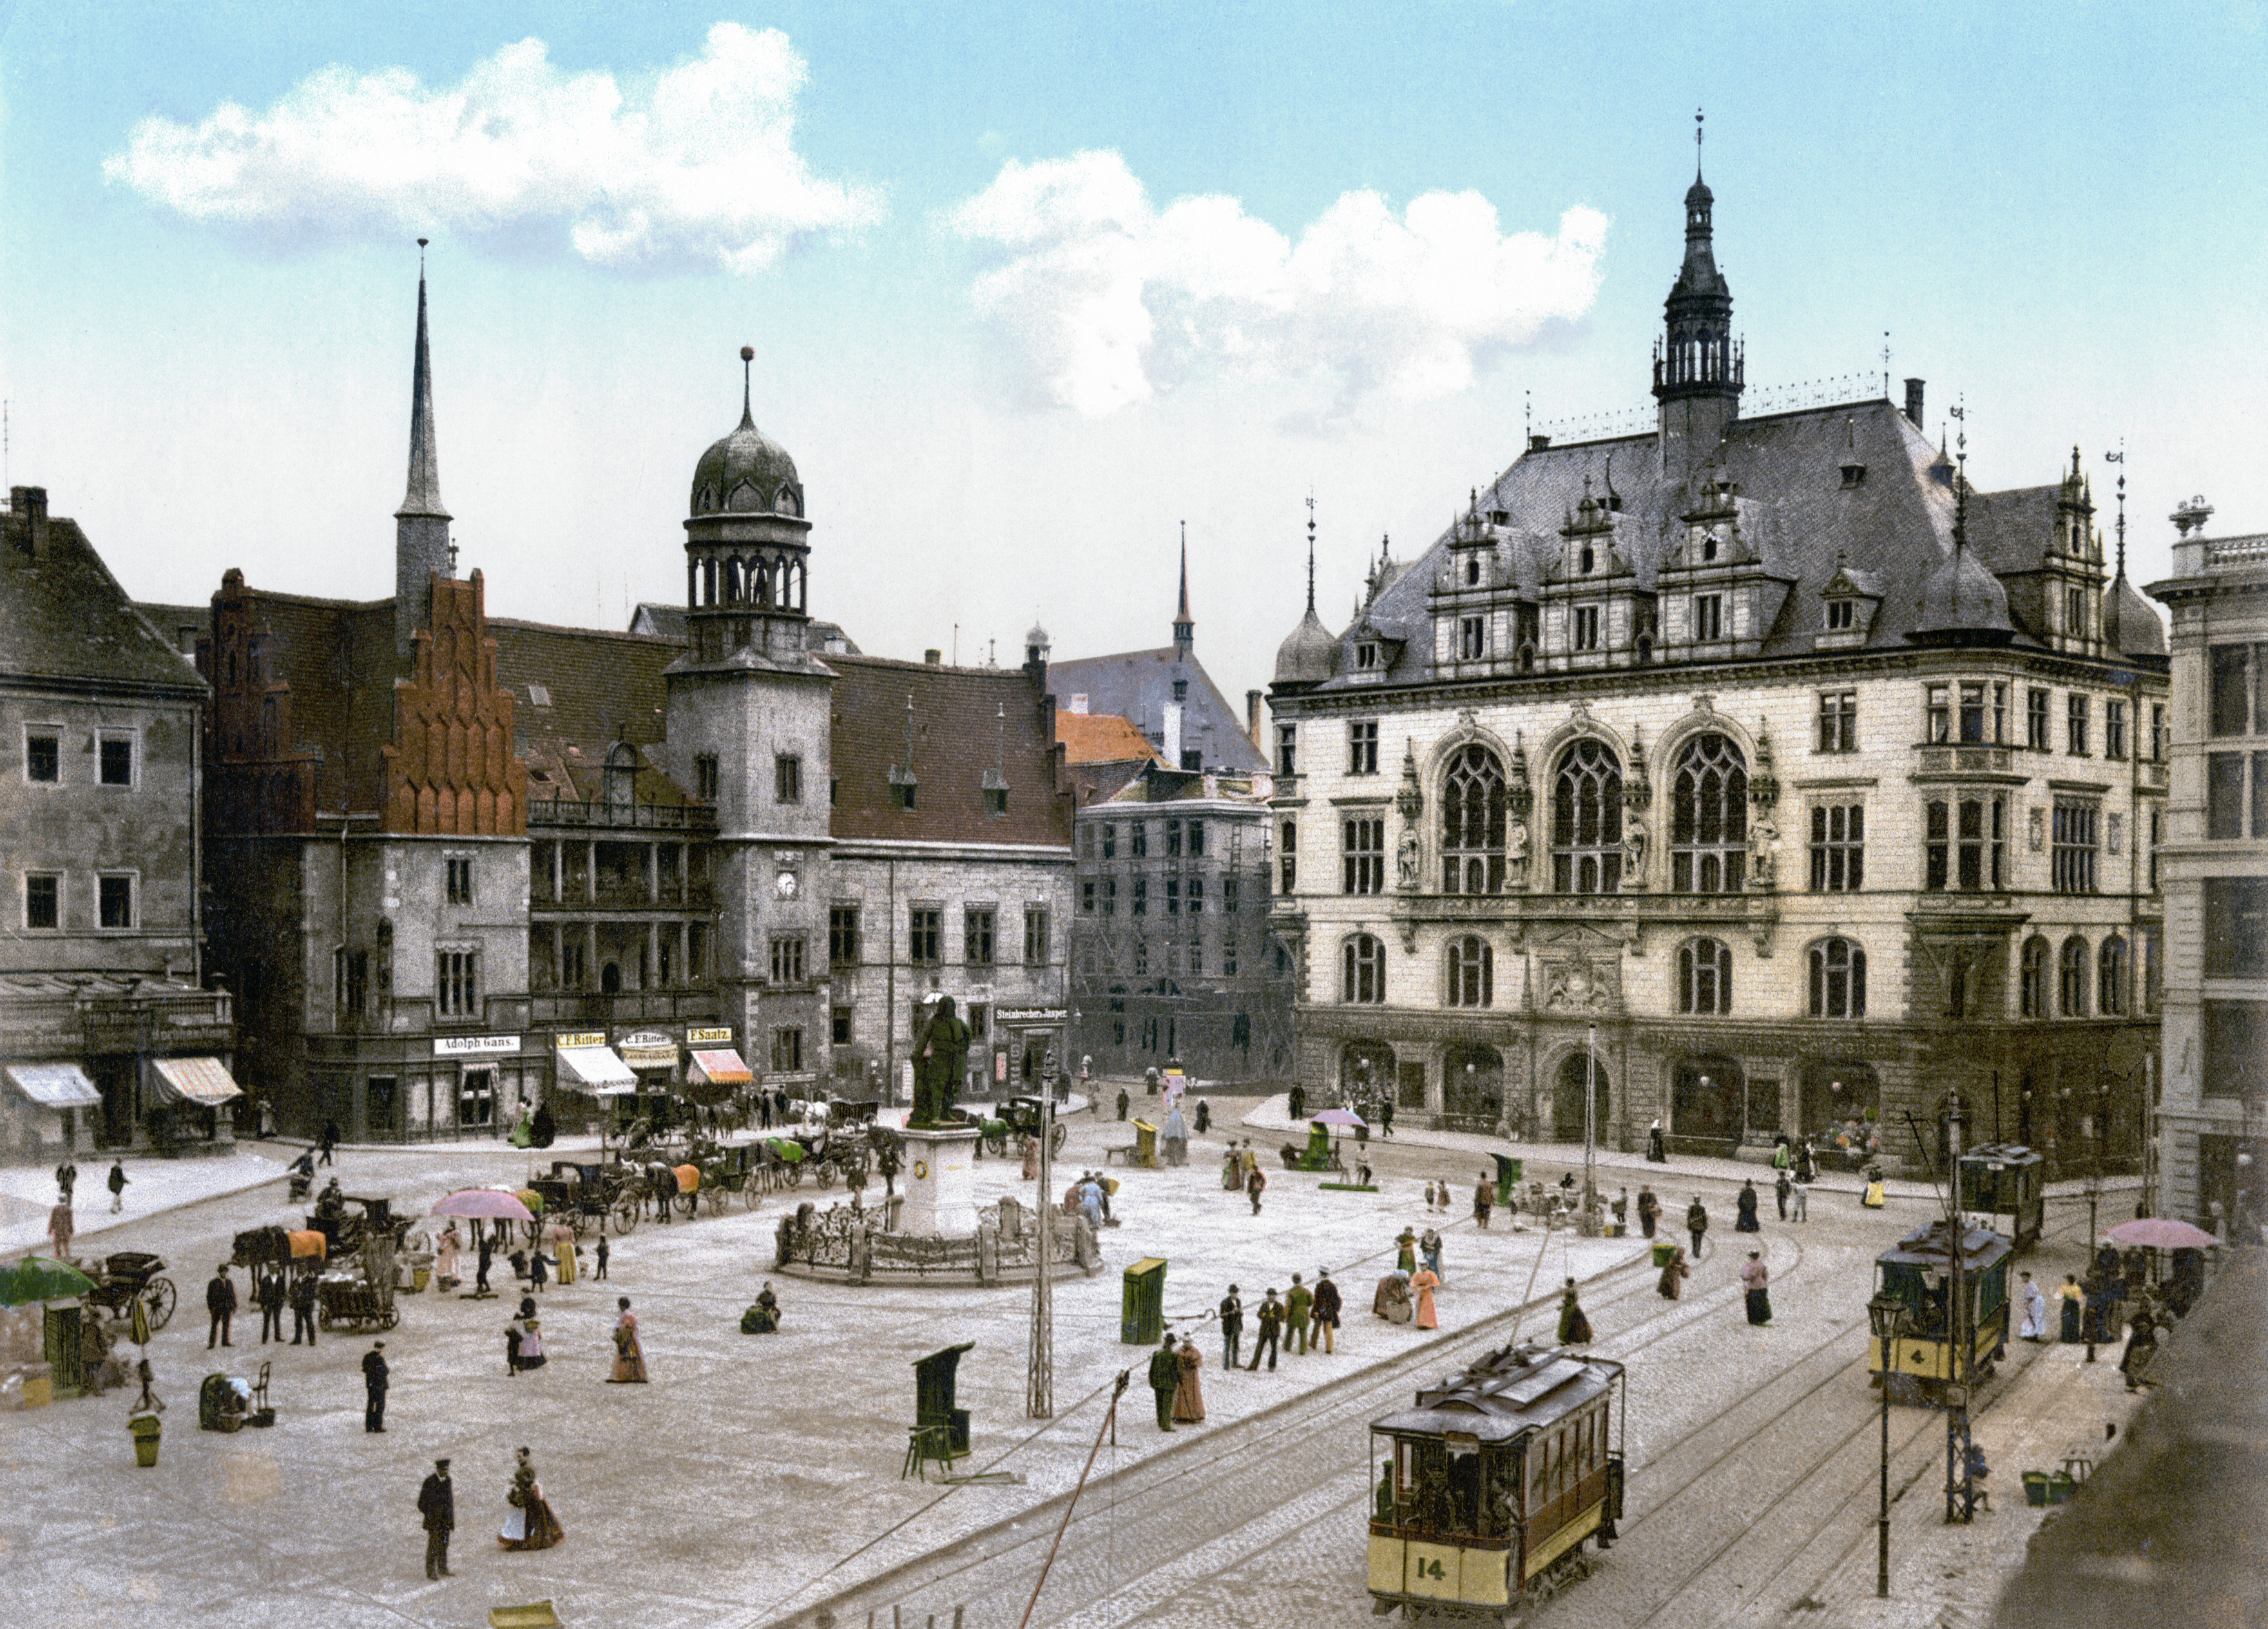 Halle an der Saale Germany  city images : Datei:Halle Saale Marktplatz 1900 – Wikipedia